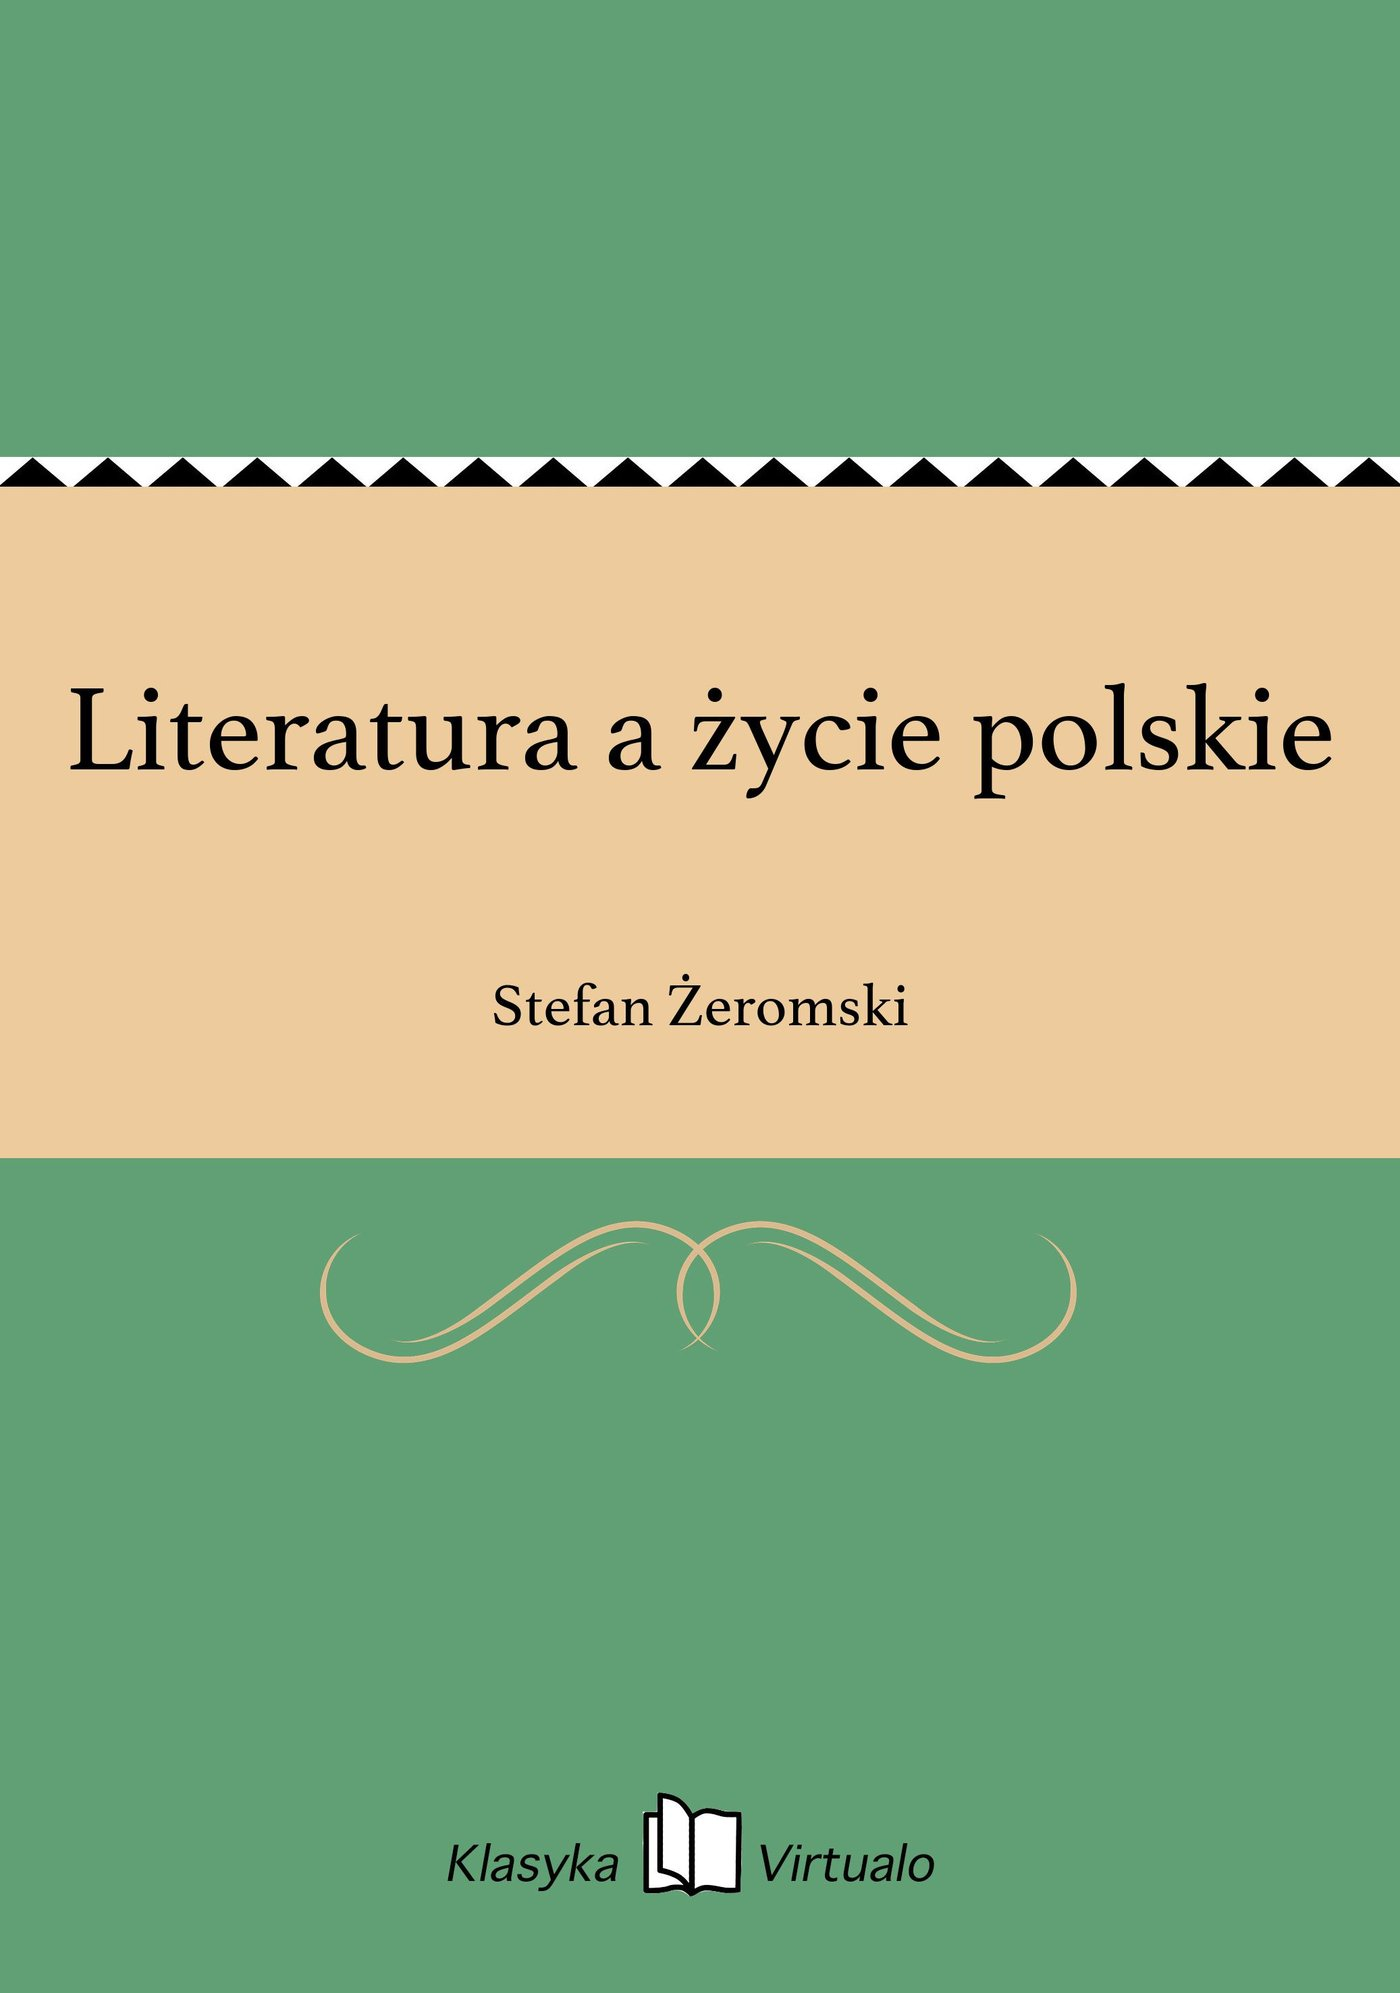 Literatura a życie polskie - Ebook (Książka EPUB) do pobrania w formacie EPUB